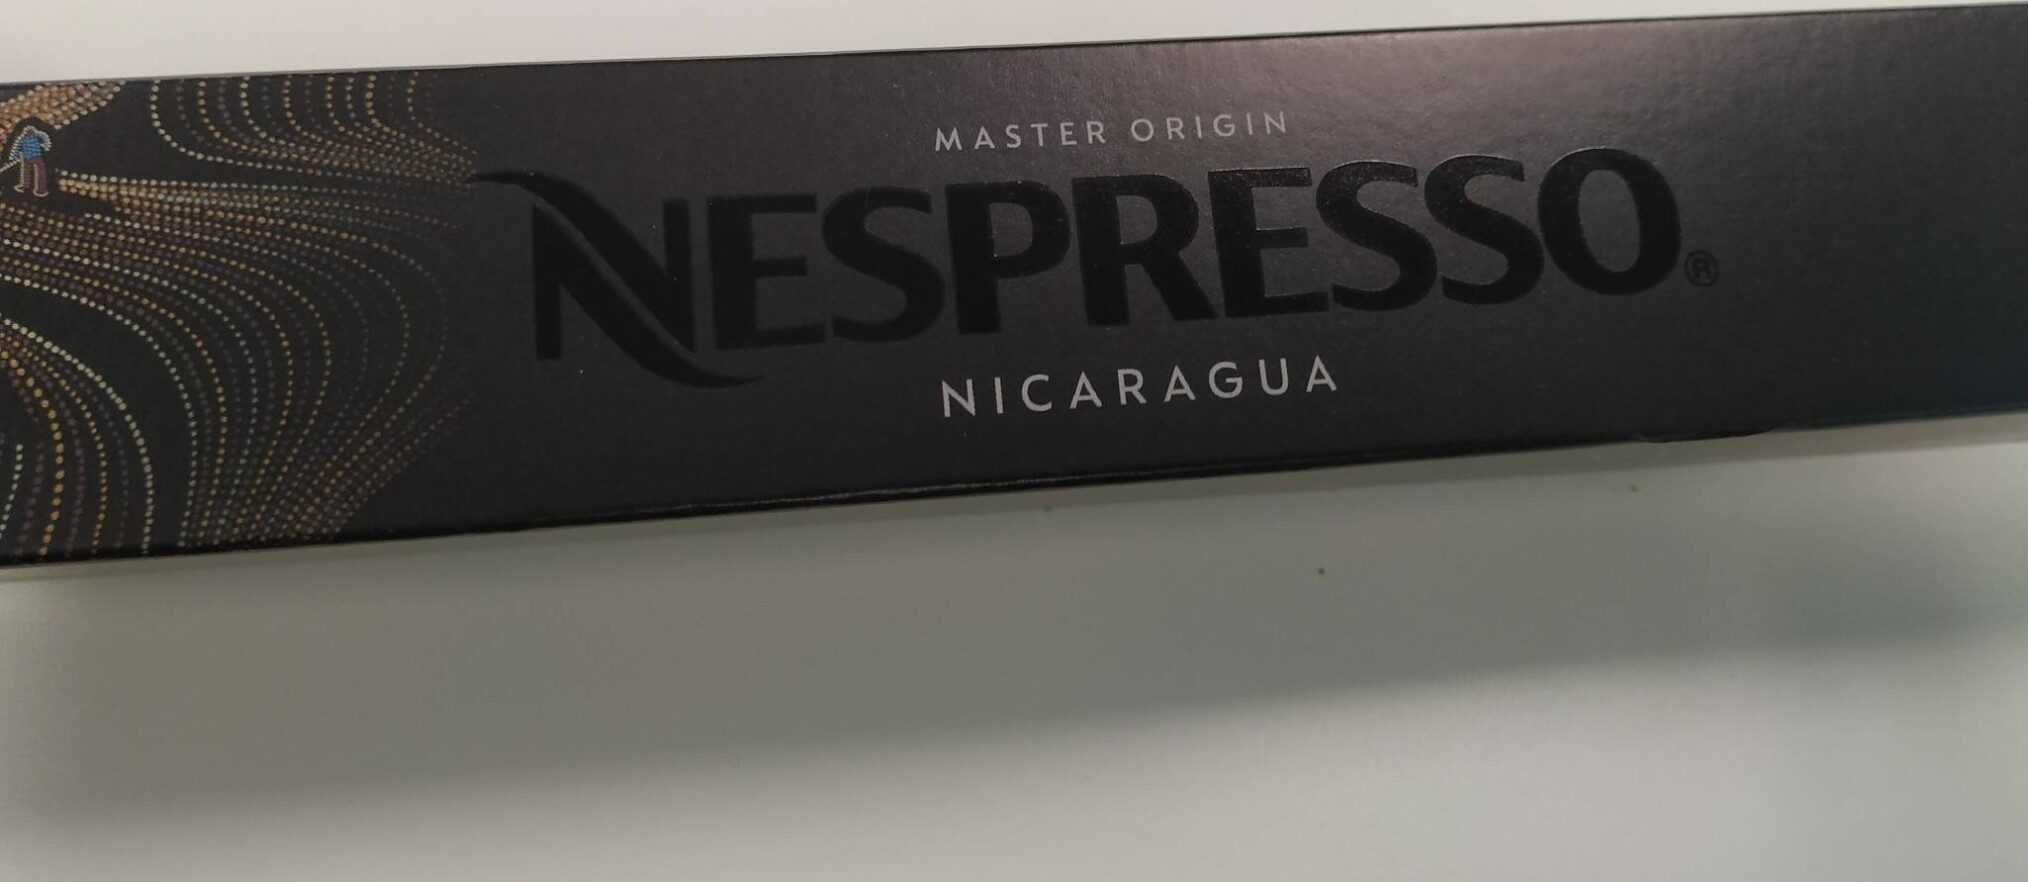 Nicaragua - Product